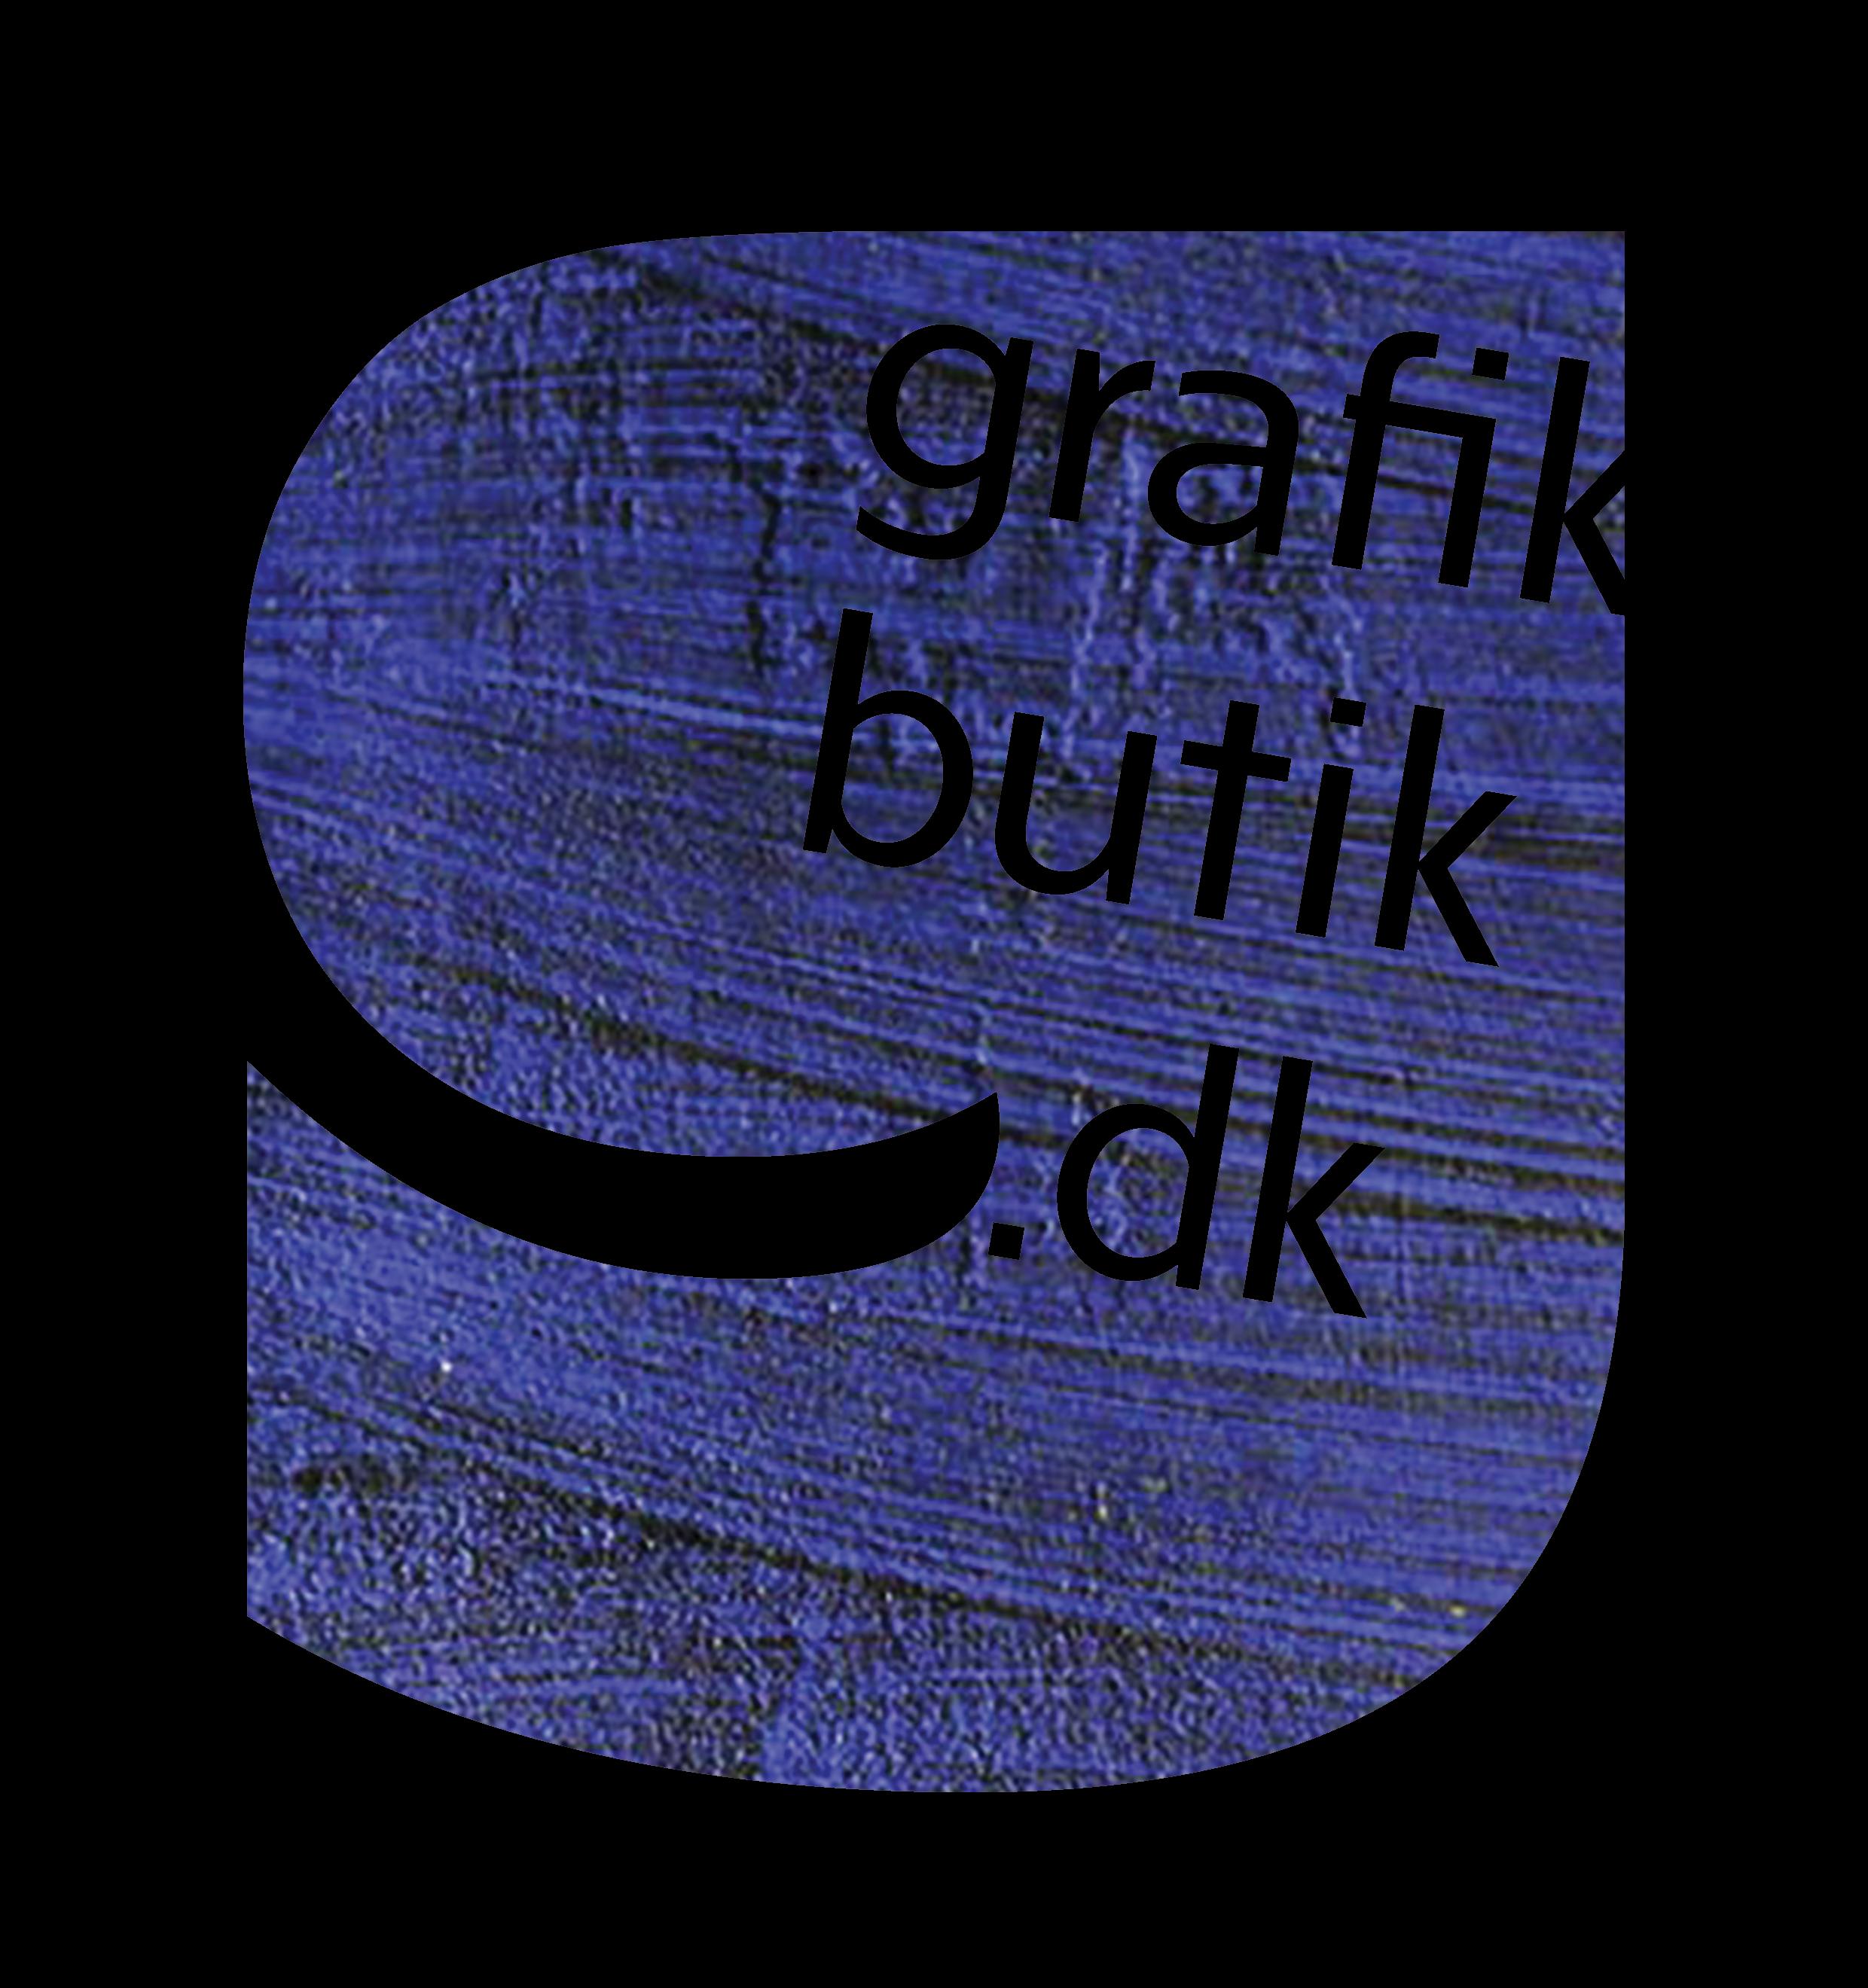 Grafikbutik.dk